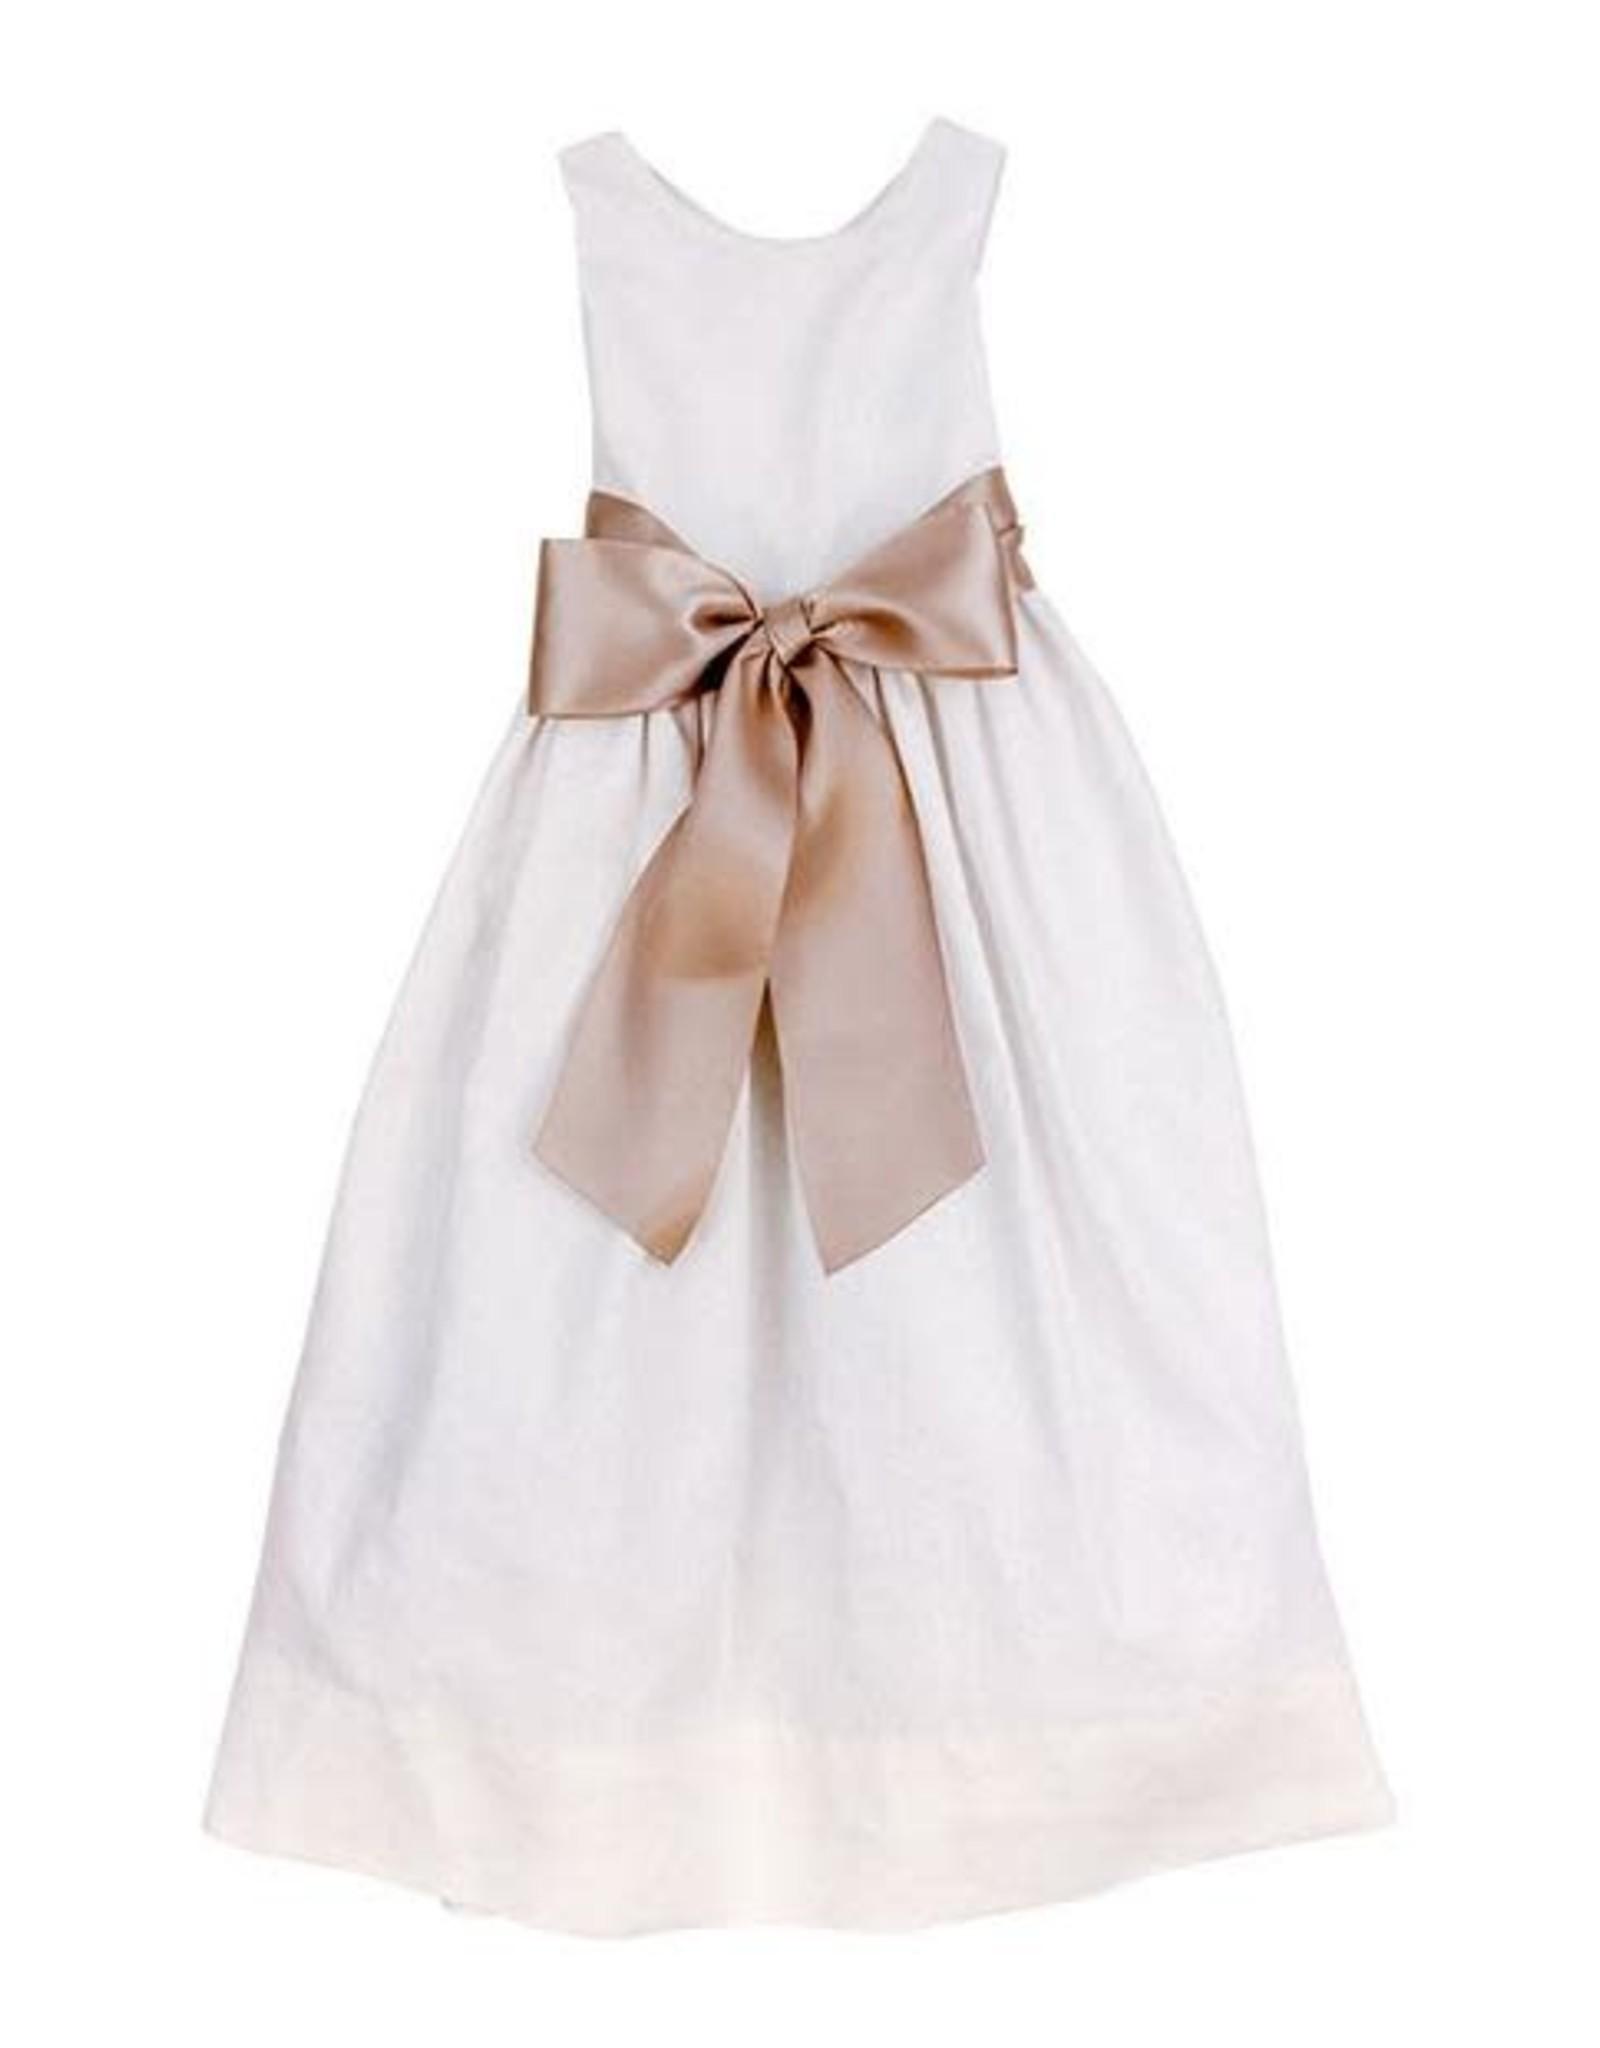 The Bailey Boys Whisper Linen, Empire Dress